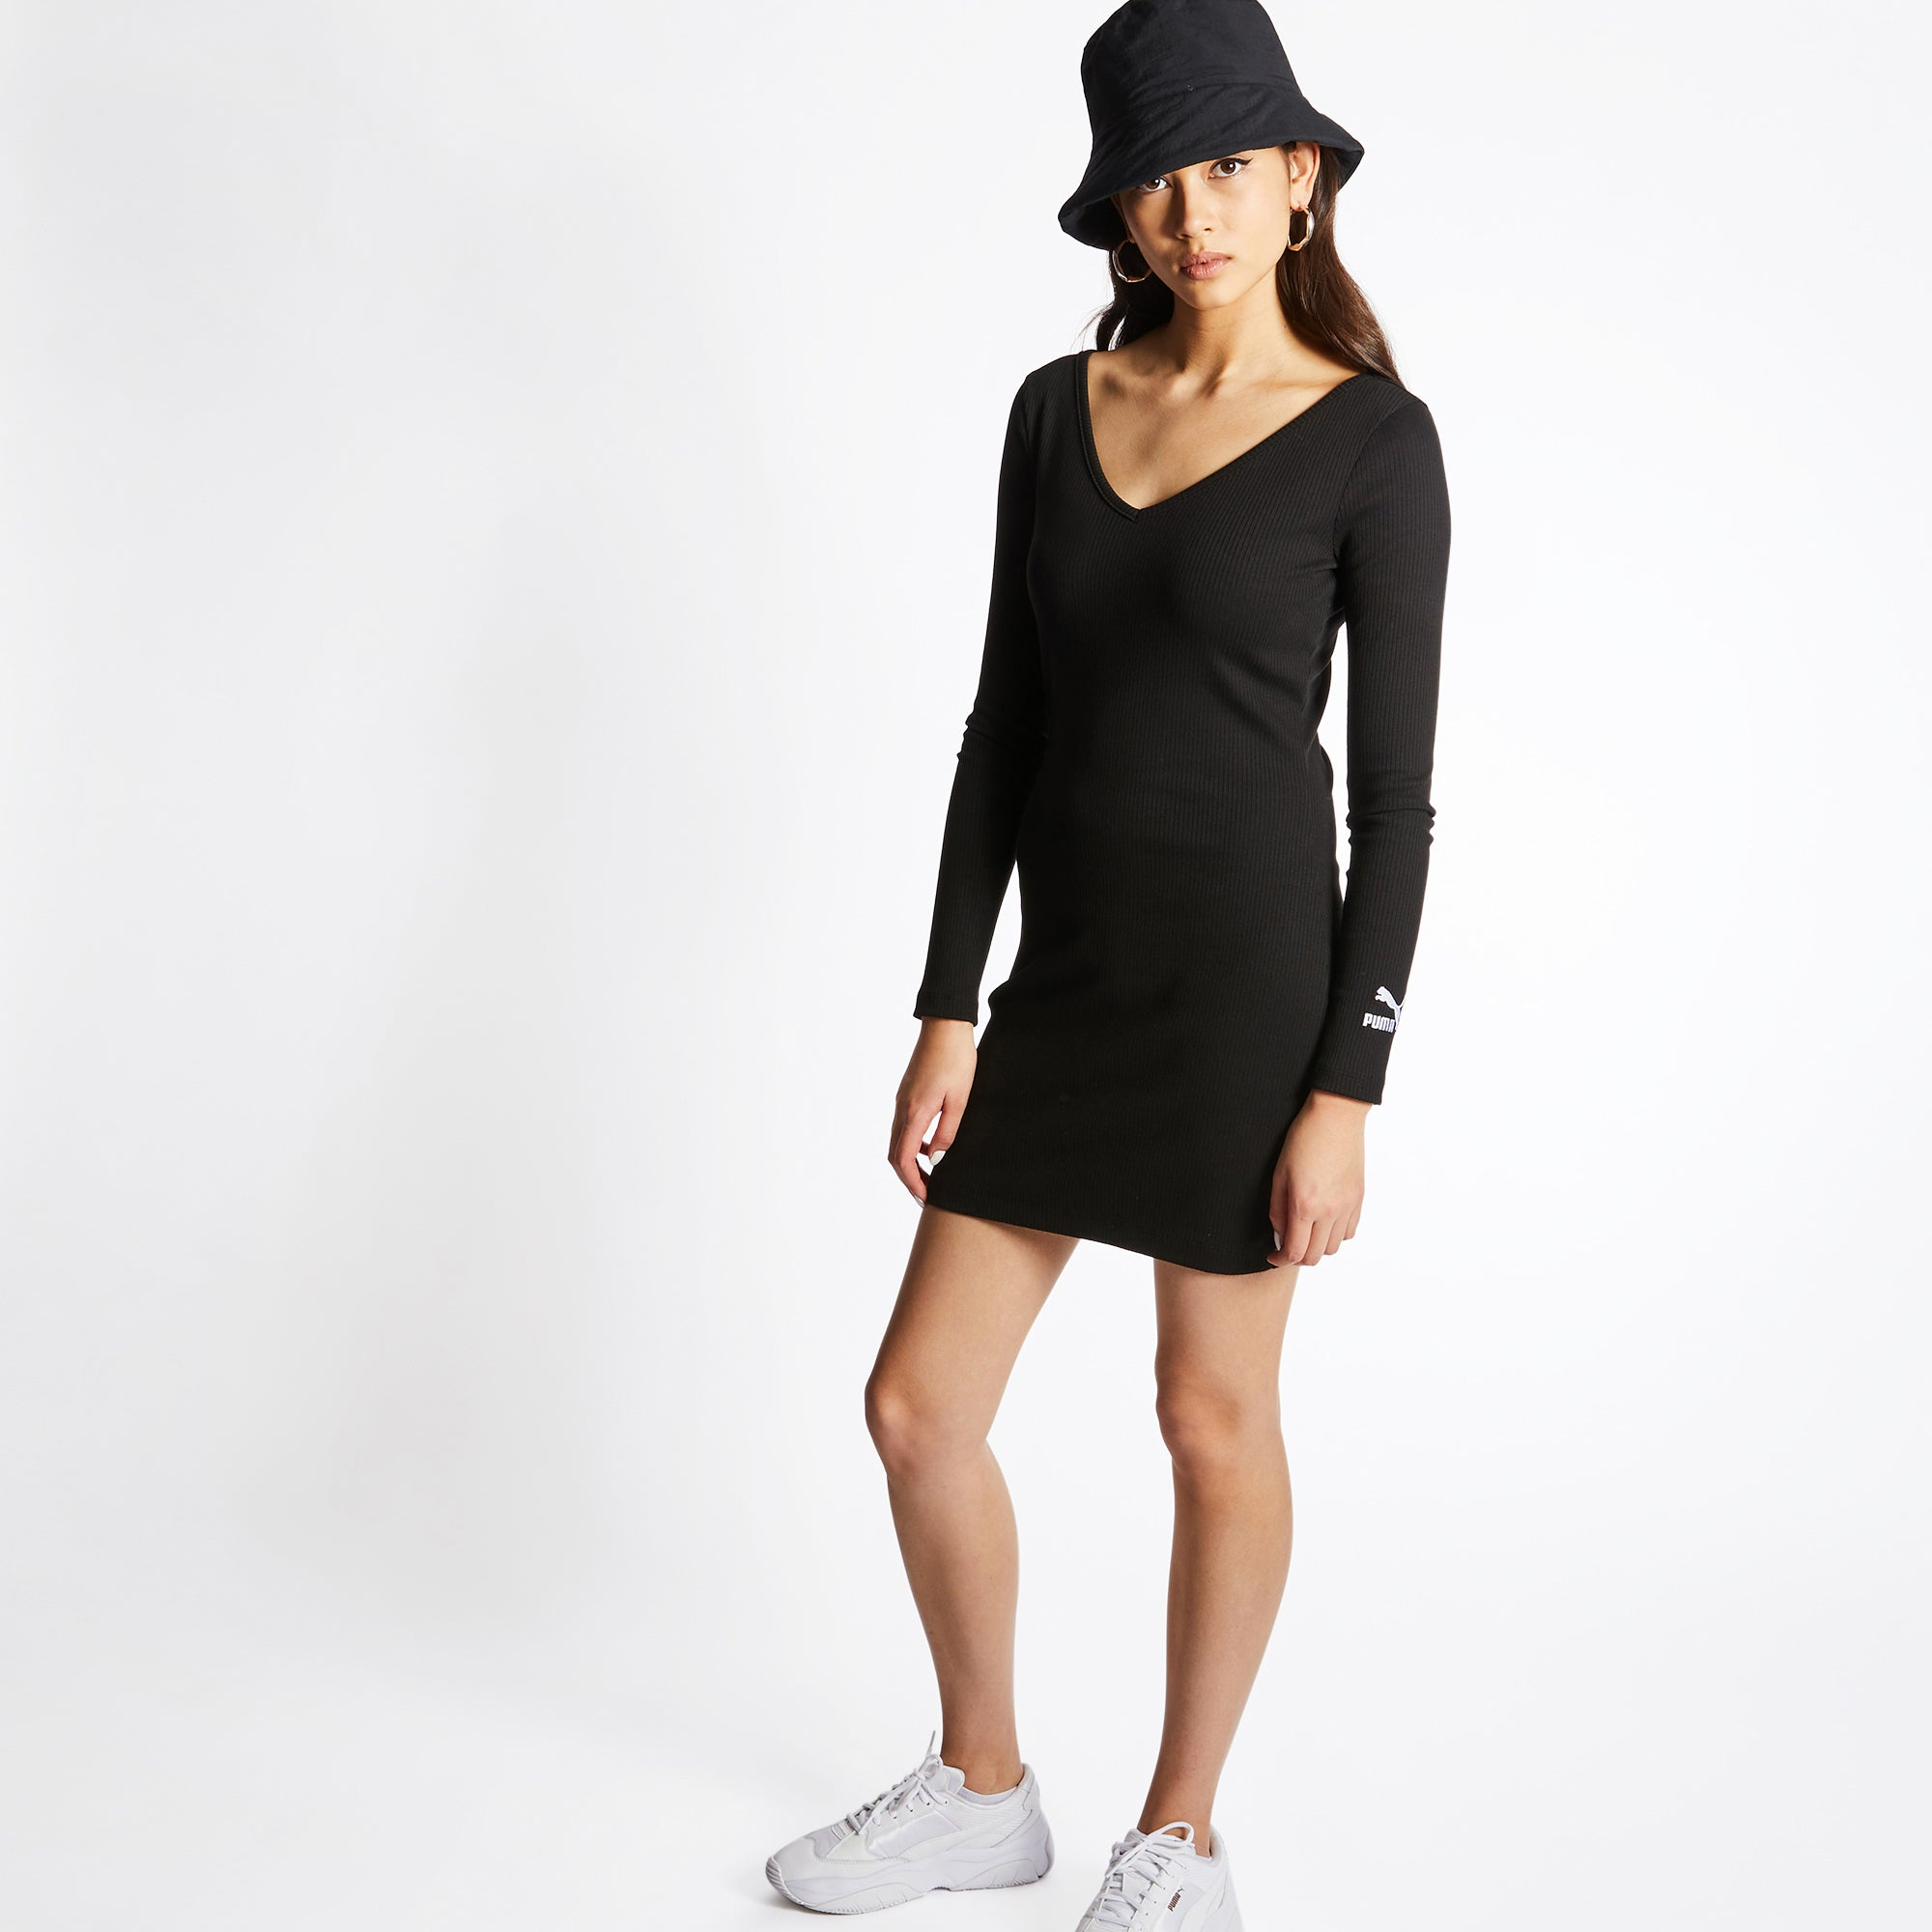 Puma Classic Rib Bodycon - Women Dresses - Image 2 of 4 Enlarged Image